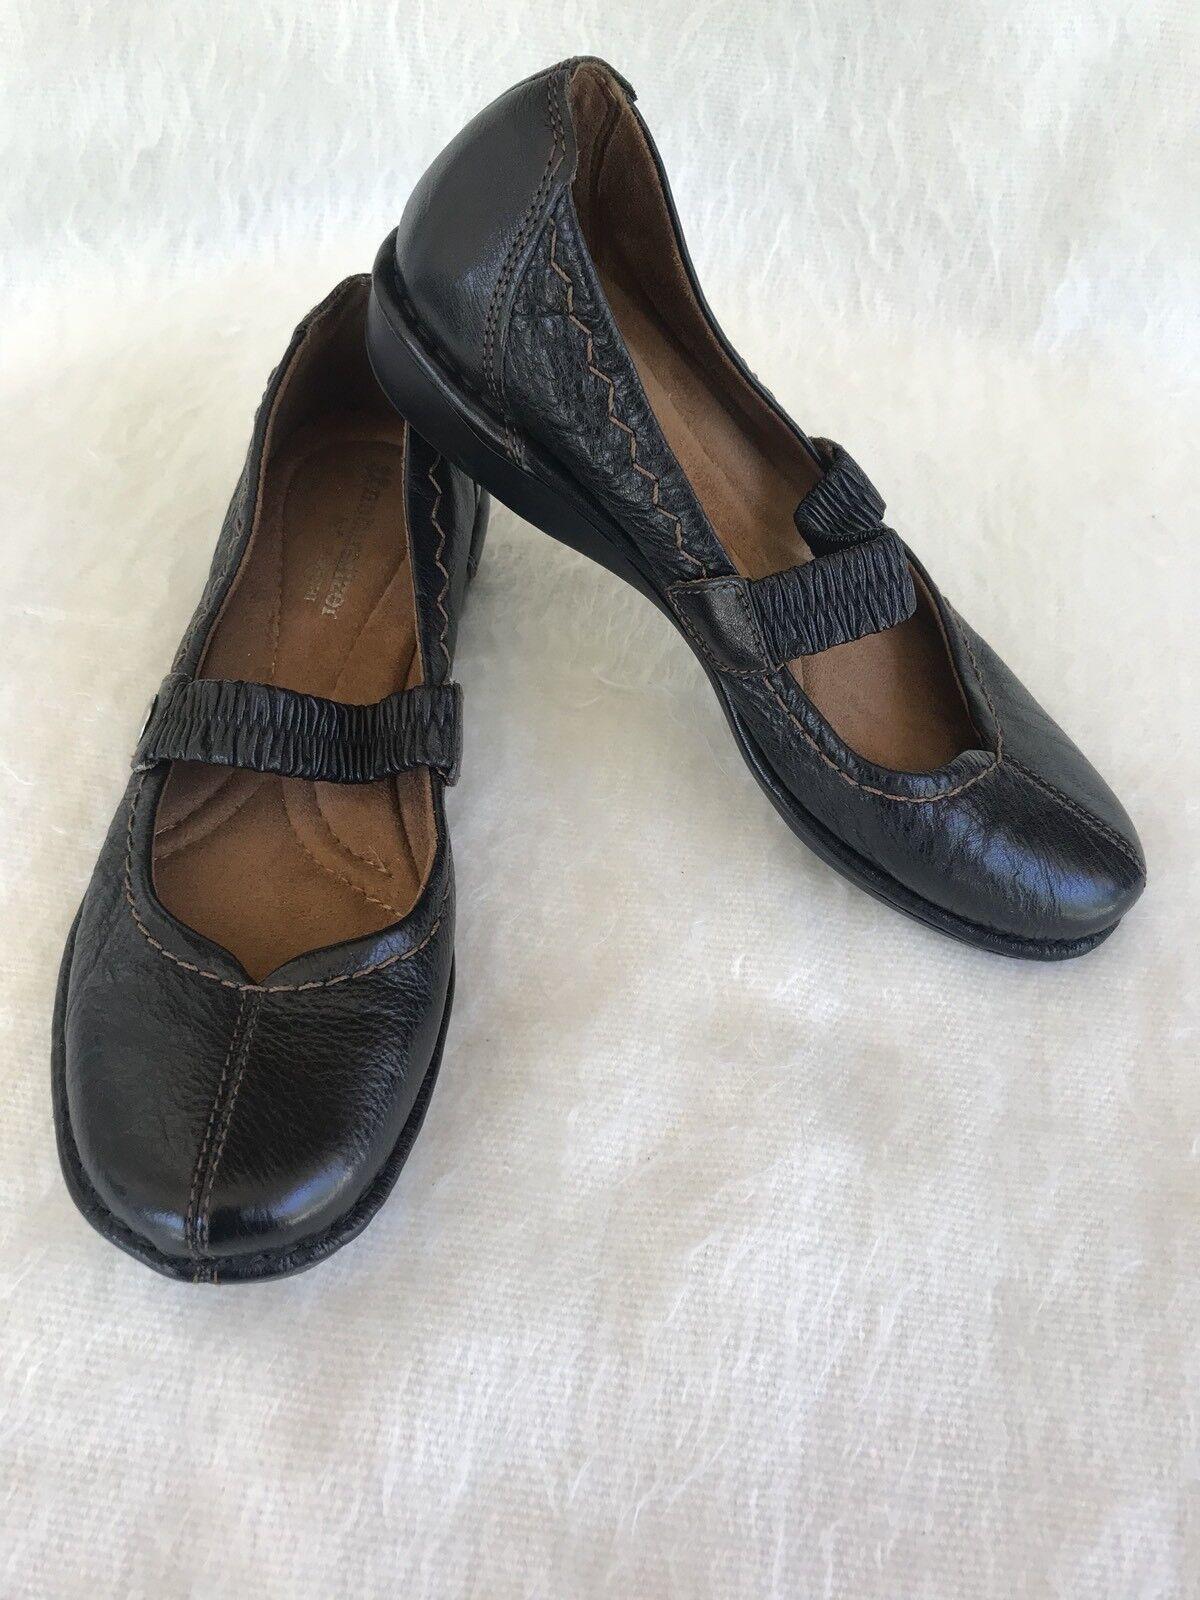 Naturalizer Revolve Shoes Size 6.5 Black Leather Shoes Revolve Orthopedic Flat Slip On Strap a36547